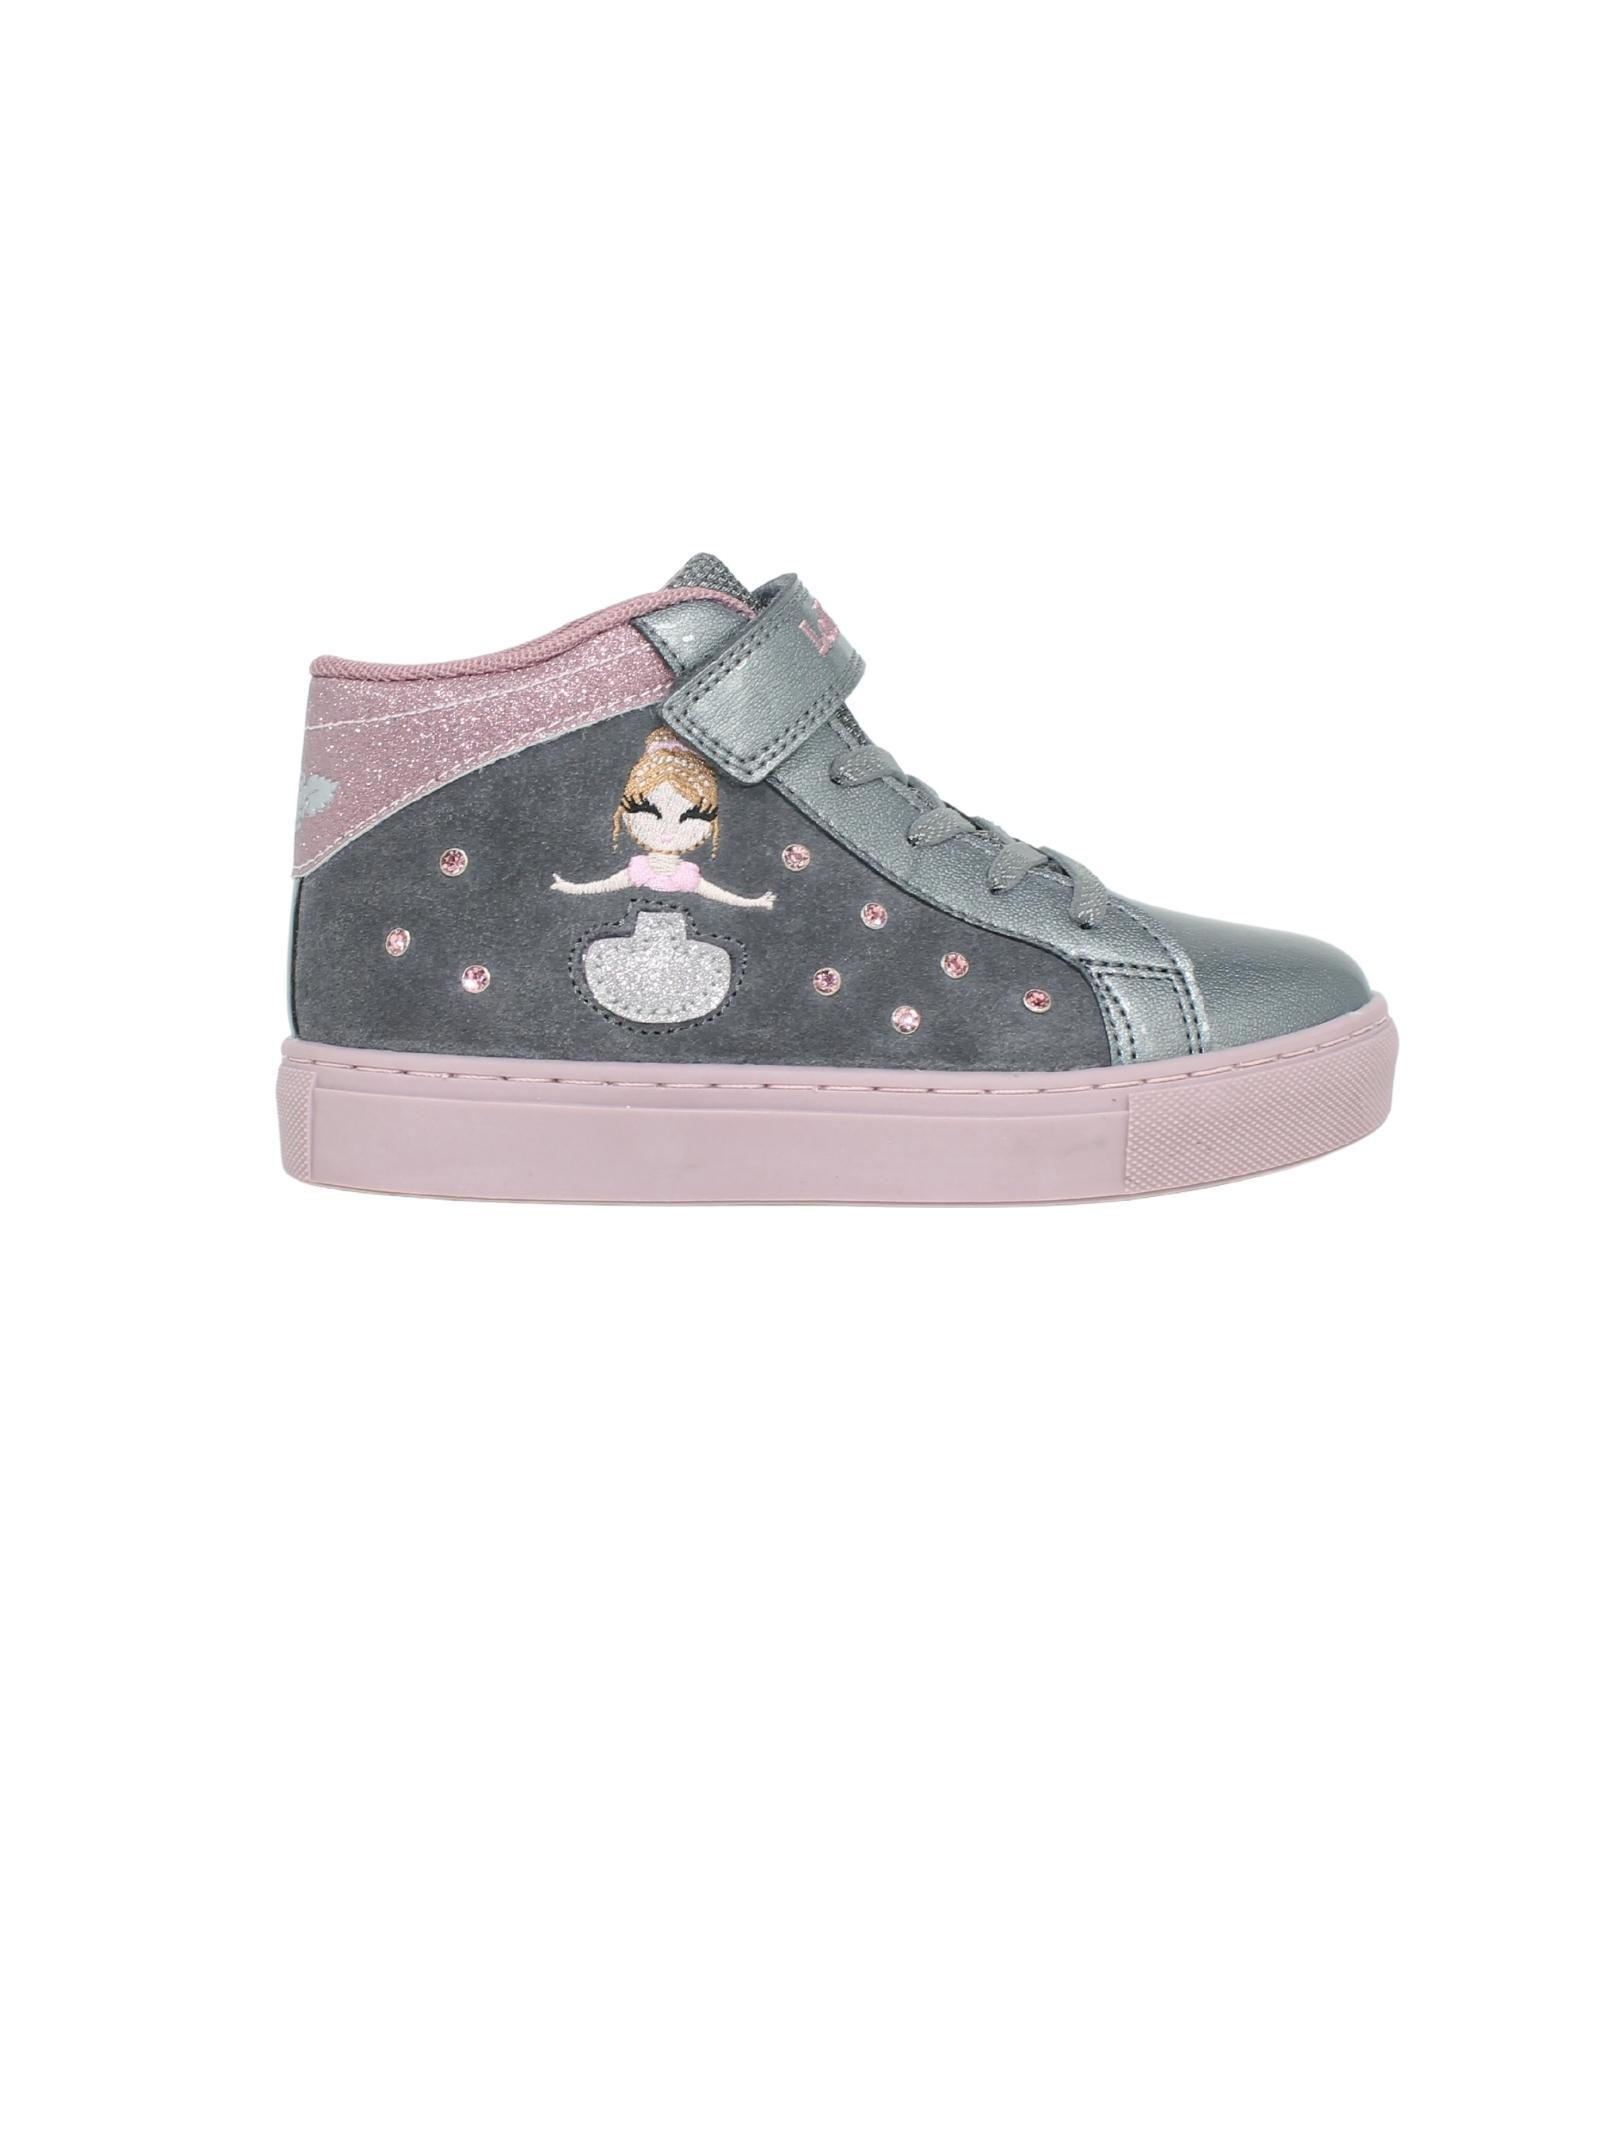 Sneakers Mille Stelle Grigia Bambina LELLI KELLY | Sneakers | LK4836GRIGIO